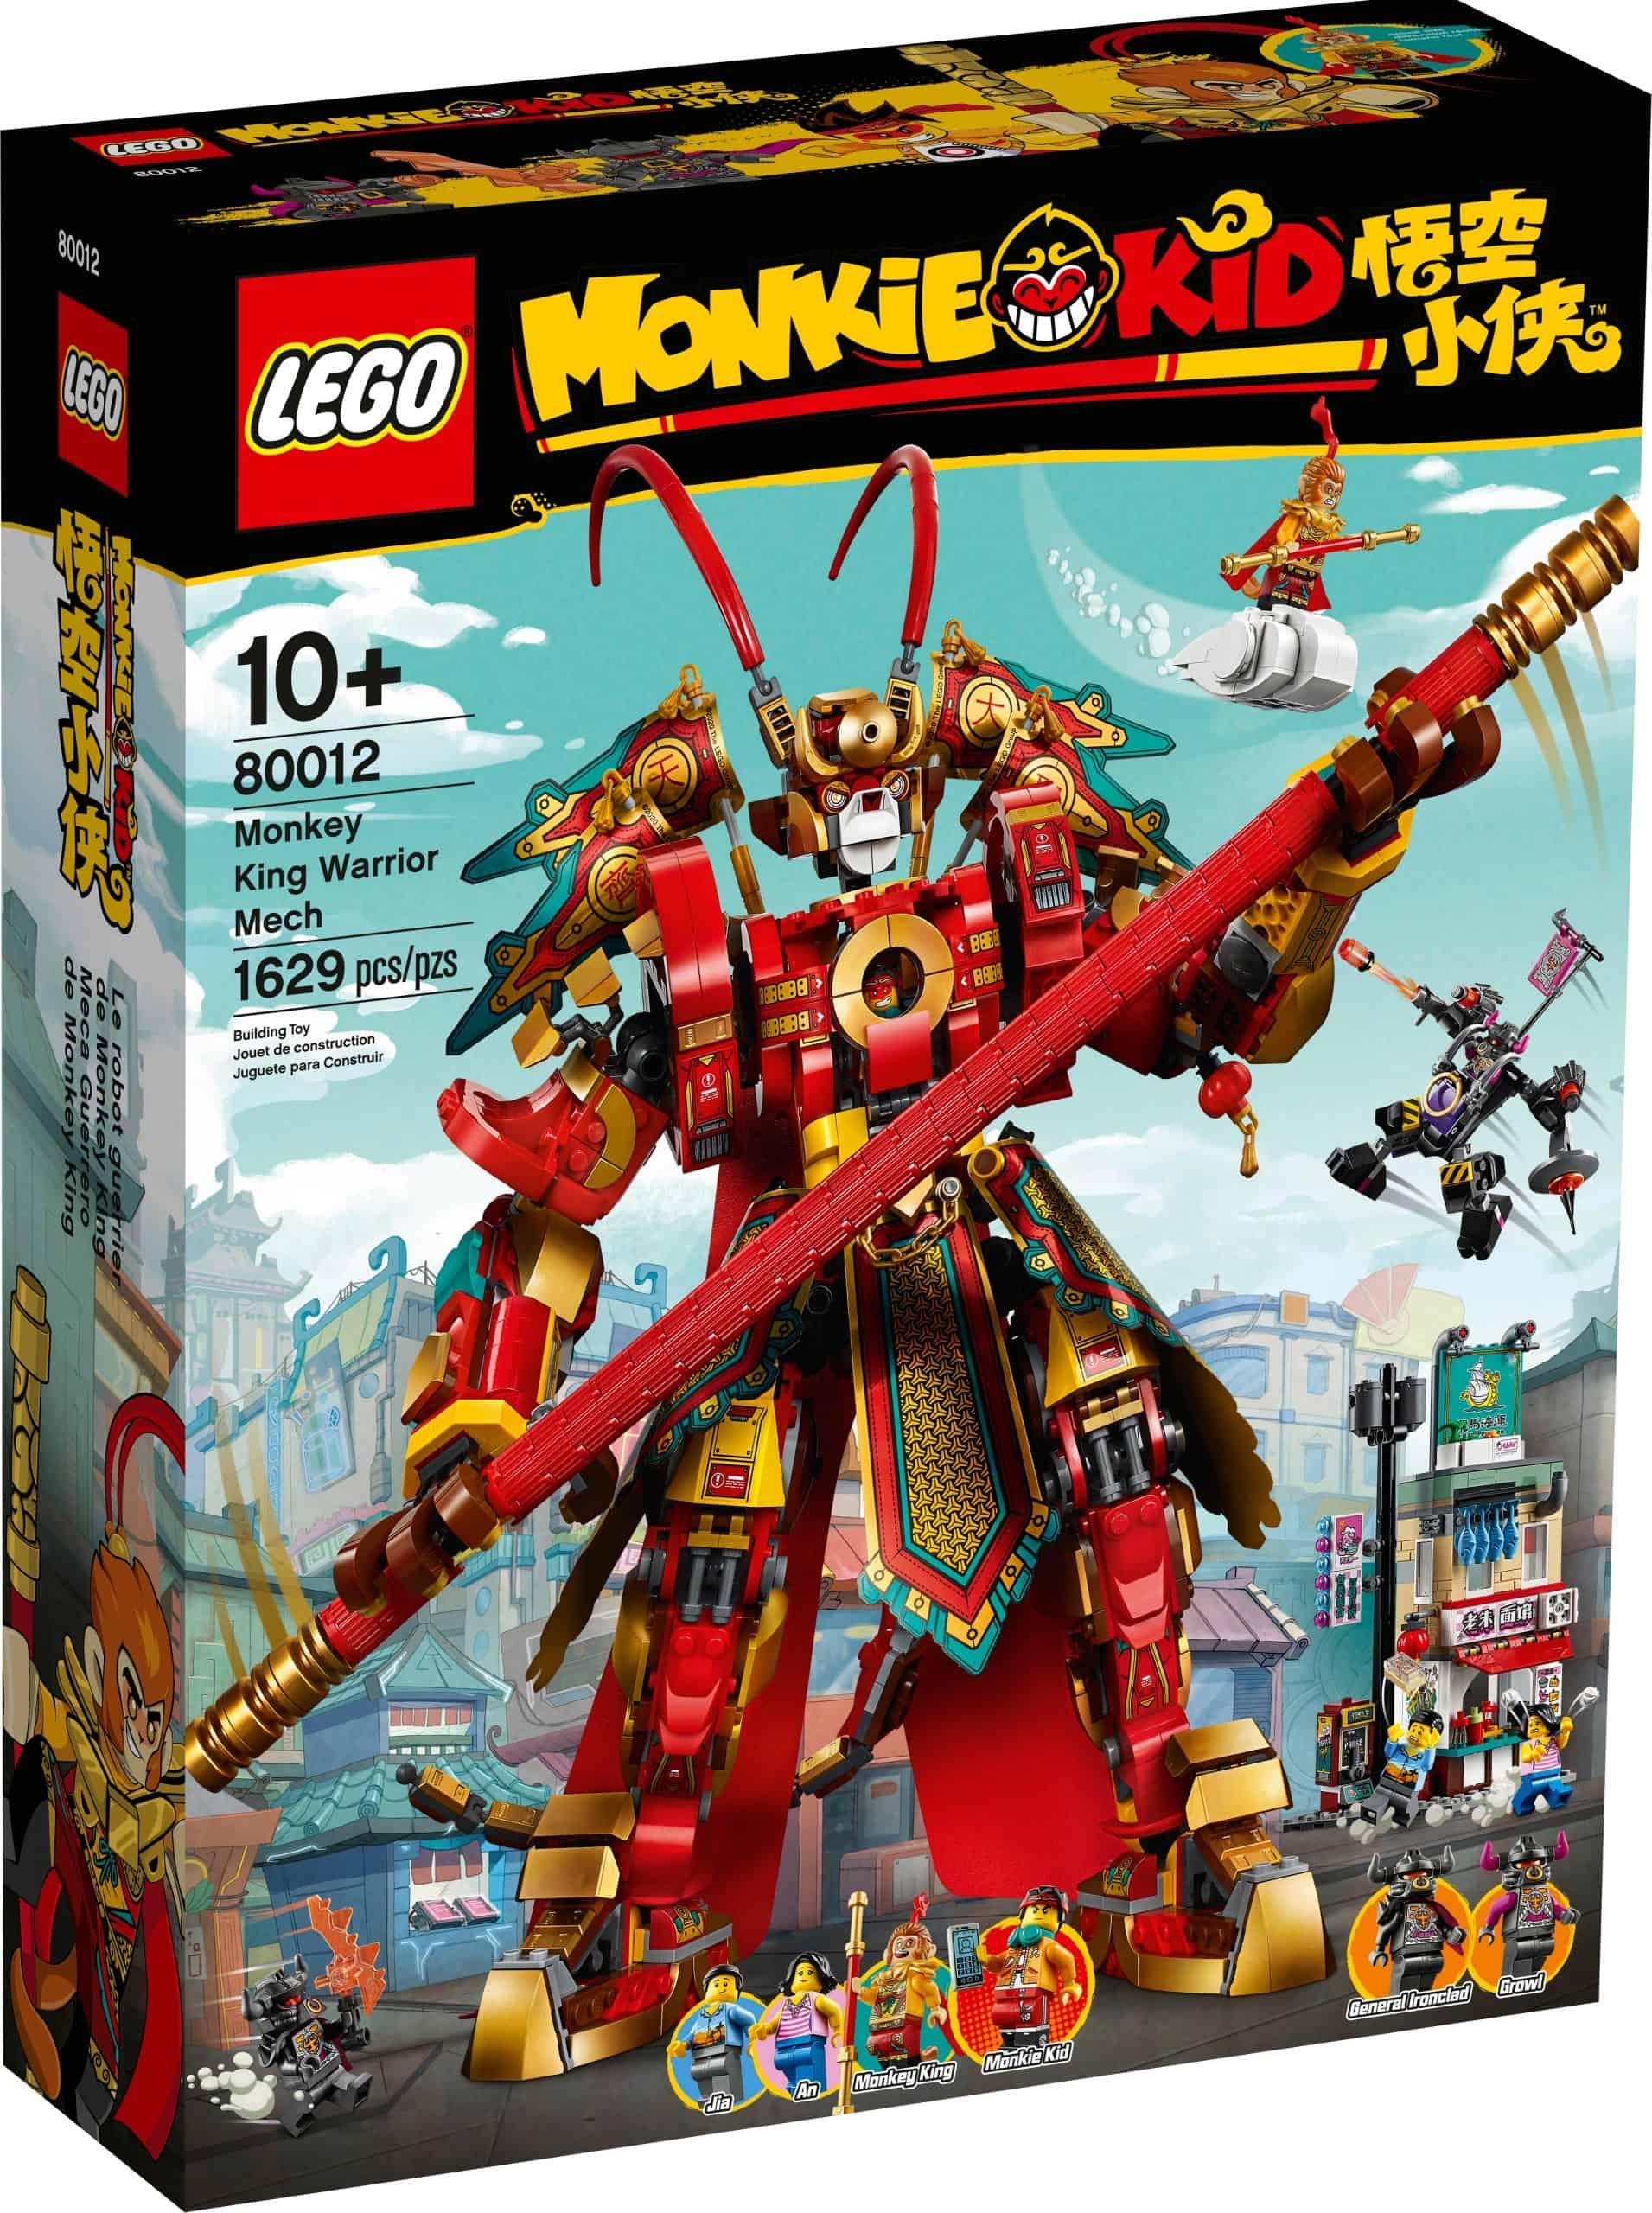 lego 80012 monkey kings krigarrobot scaled